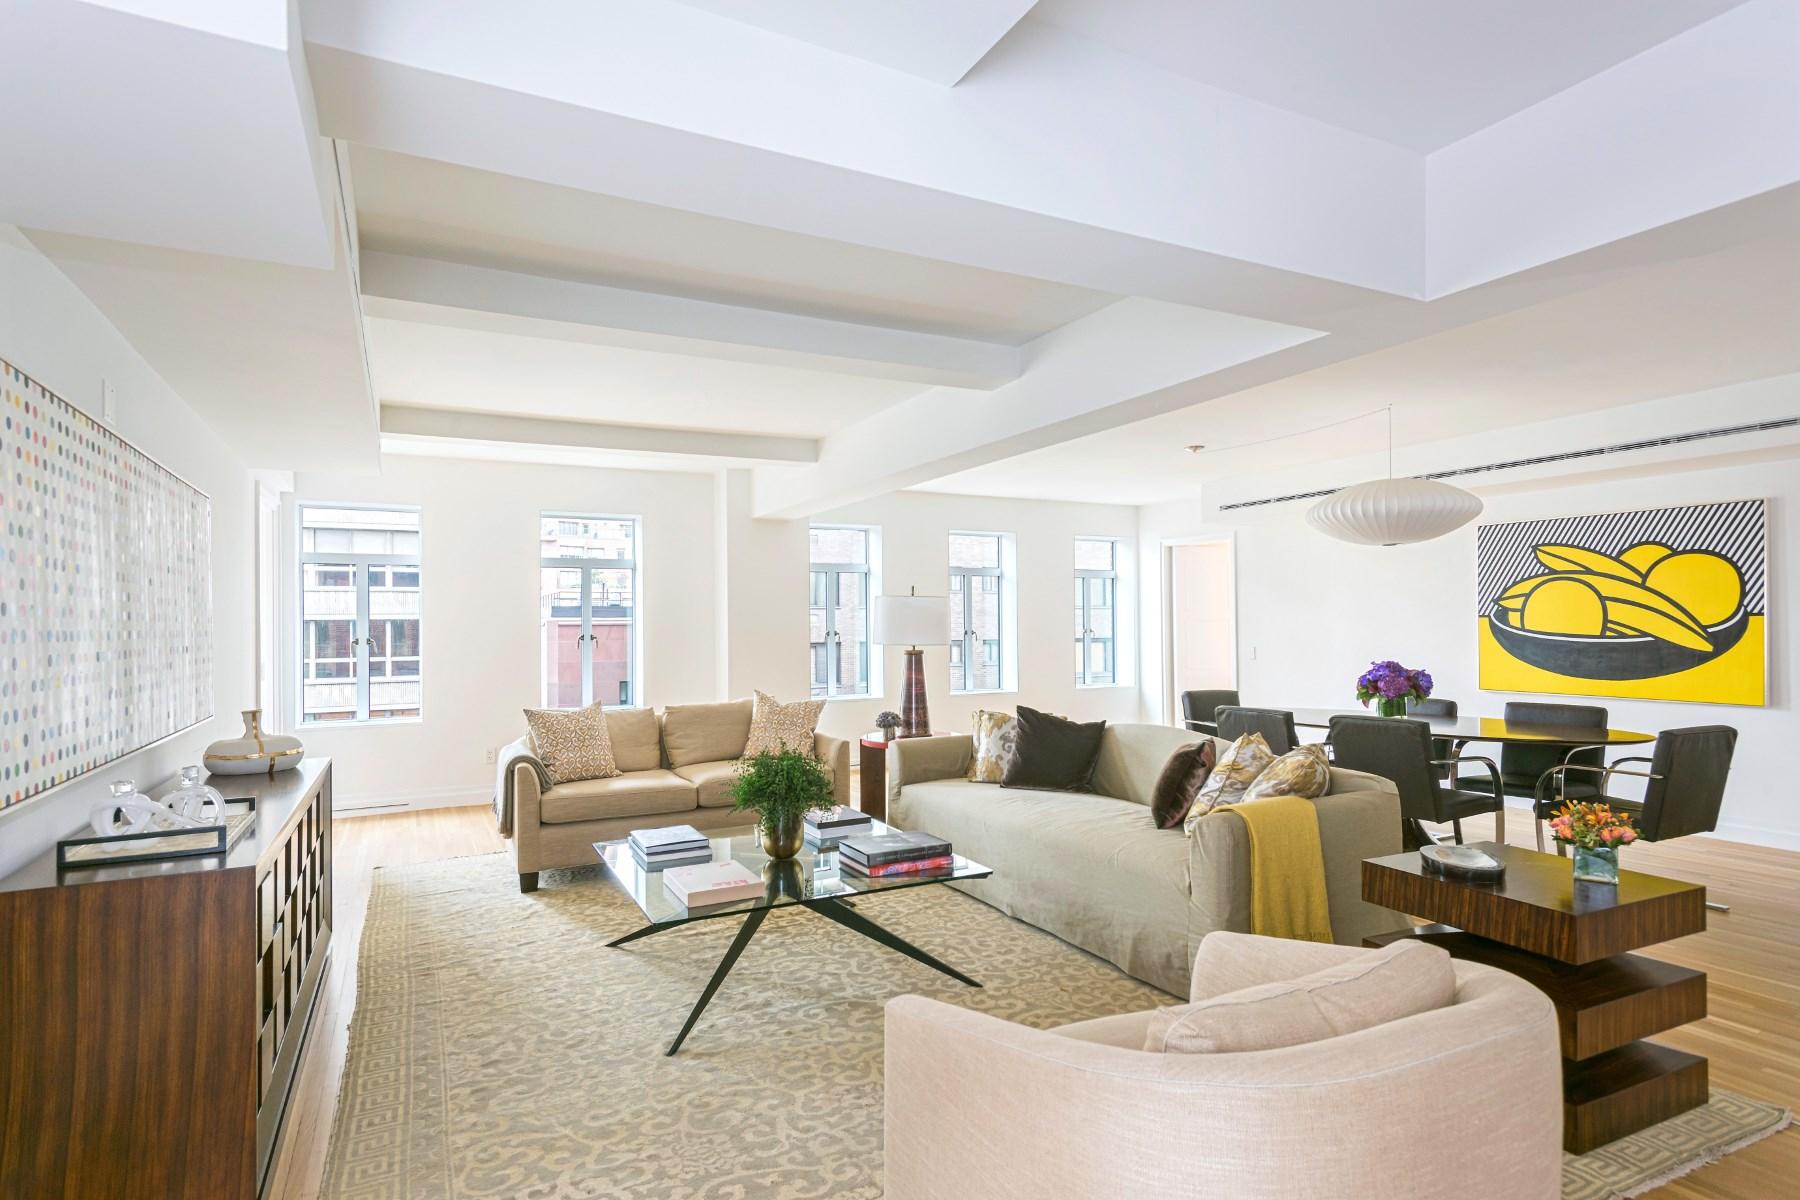 Nhà chung cư vì Bán tại 737 Park Avenue, Apt 14E 737 Park Avenue Apt 14e Upper East Side, New York, New York 10021 Hoa Kỳ